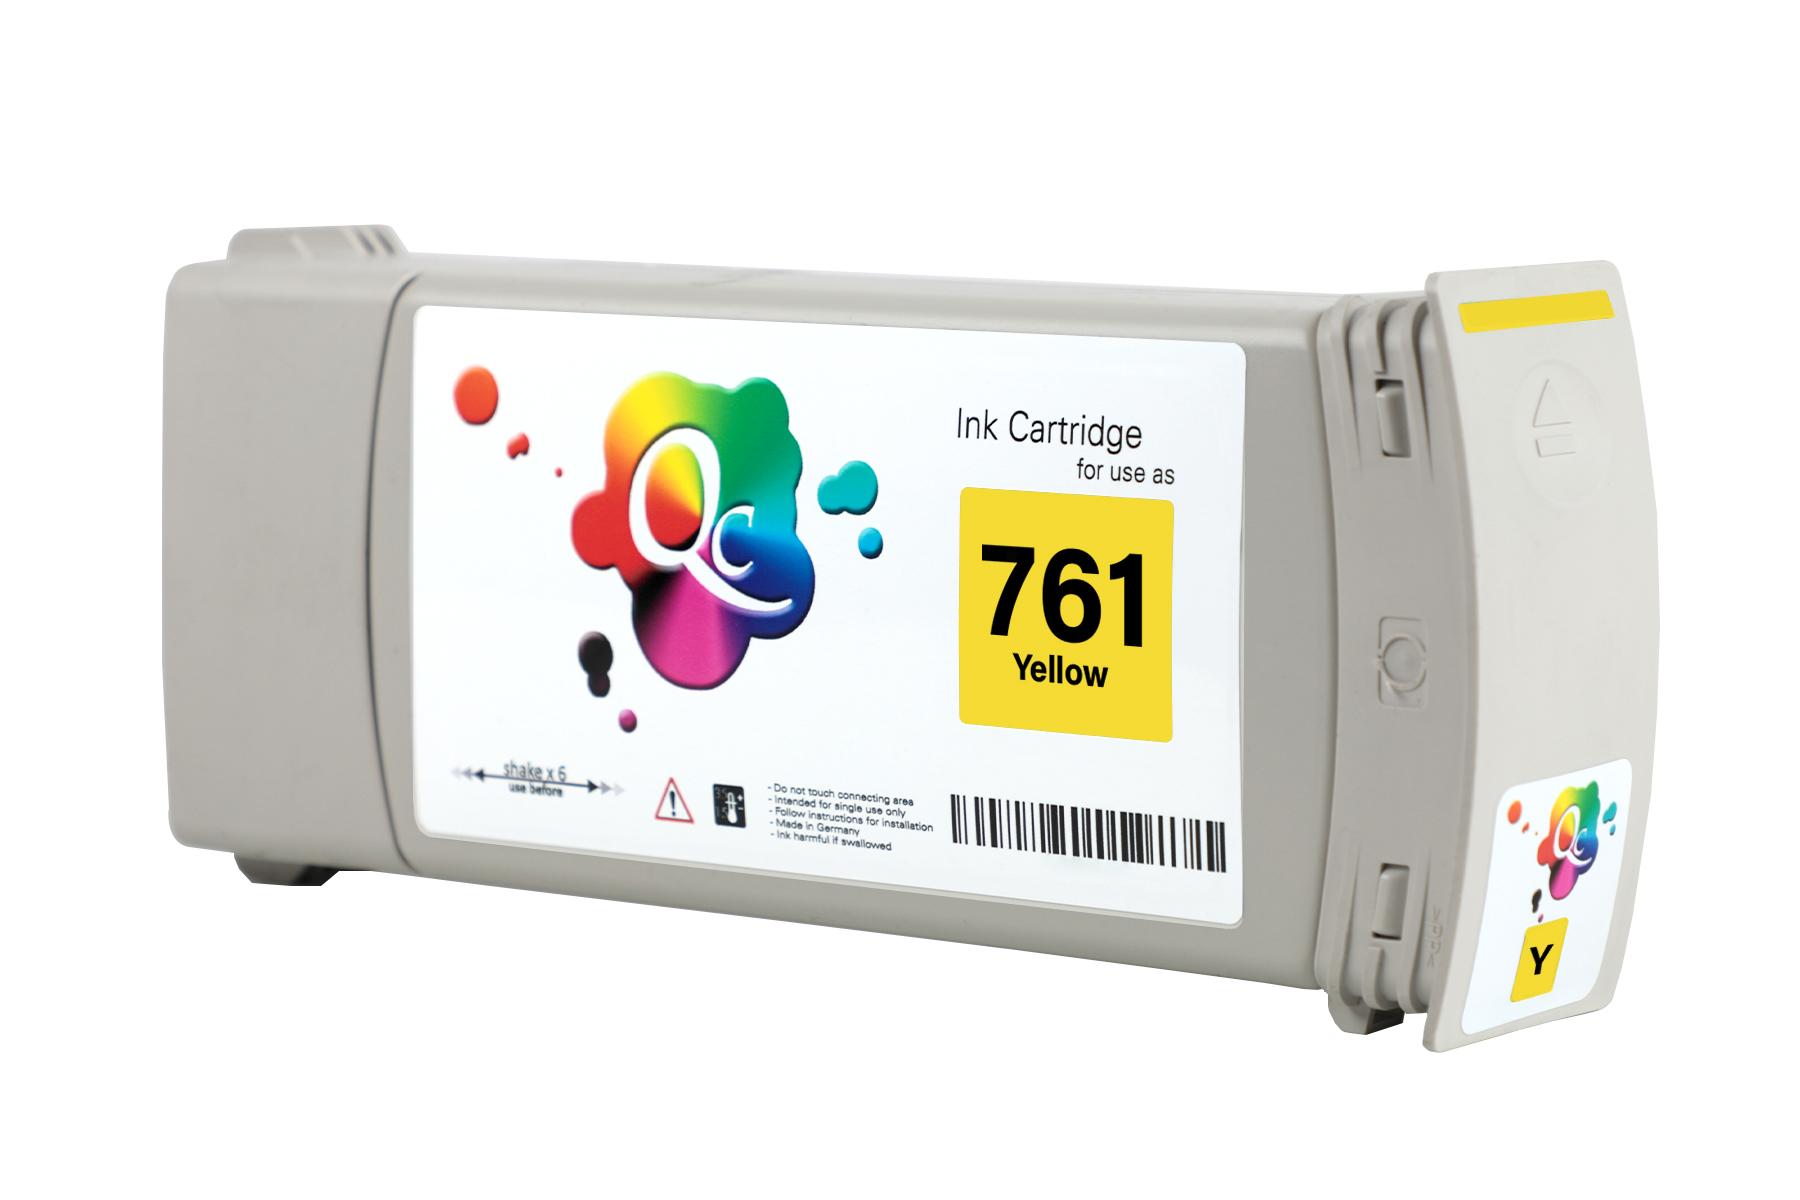 HP 761 CM992A Yellow Sarı Muadil Mürekkep Kartuş 400ml